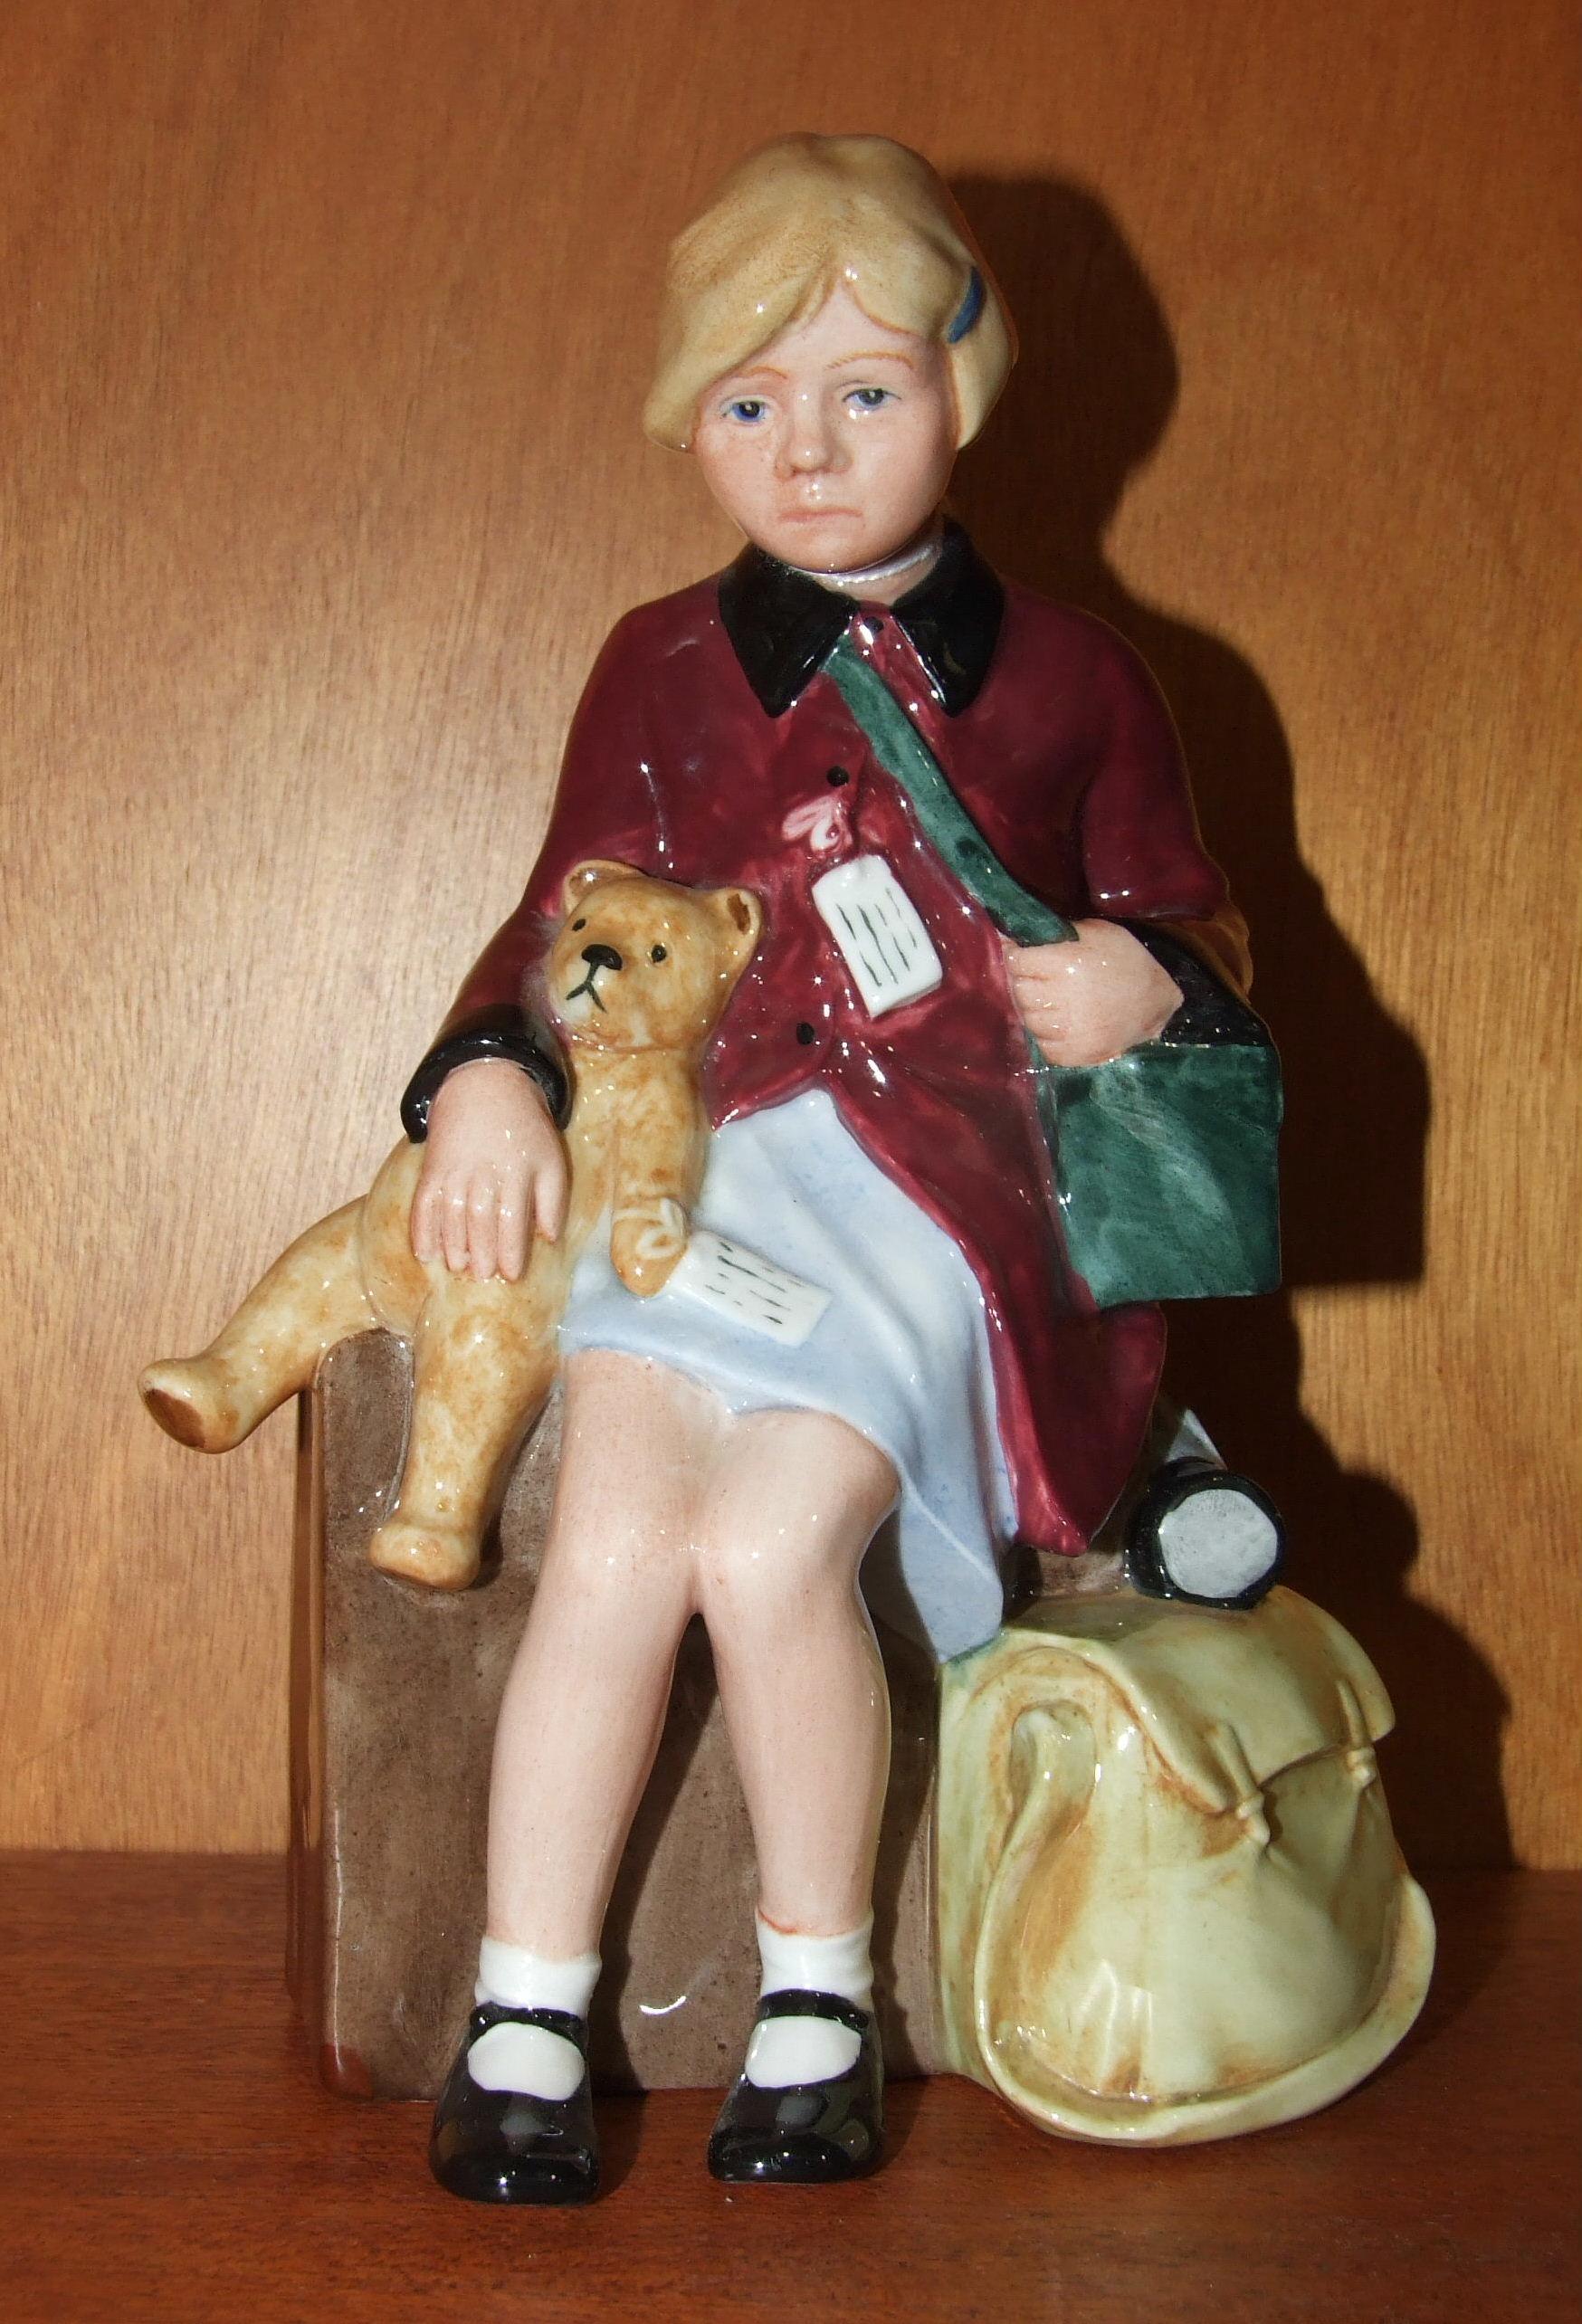 Lot 132 - A Royal Doulton figure 'The Girl Evacuee' HN3203, 20cm high.